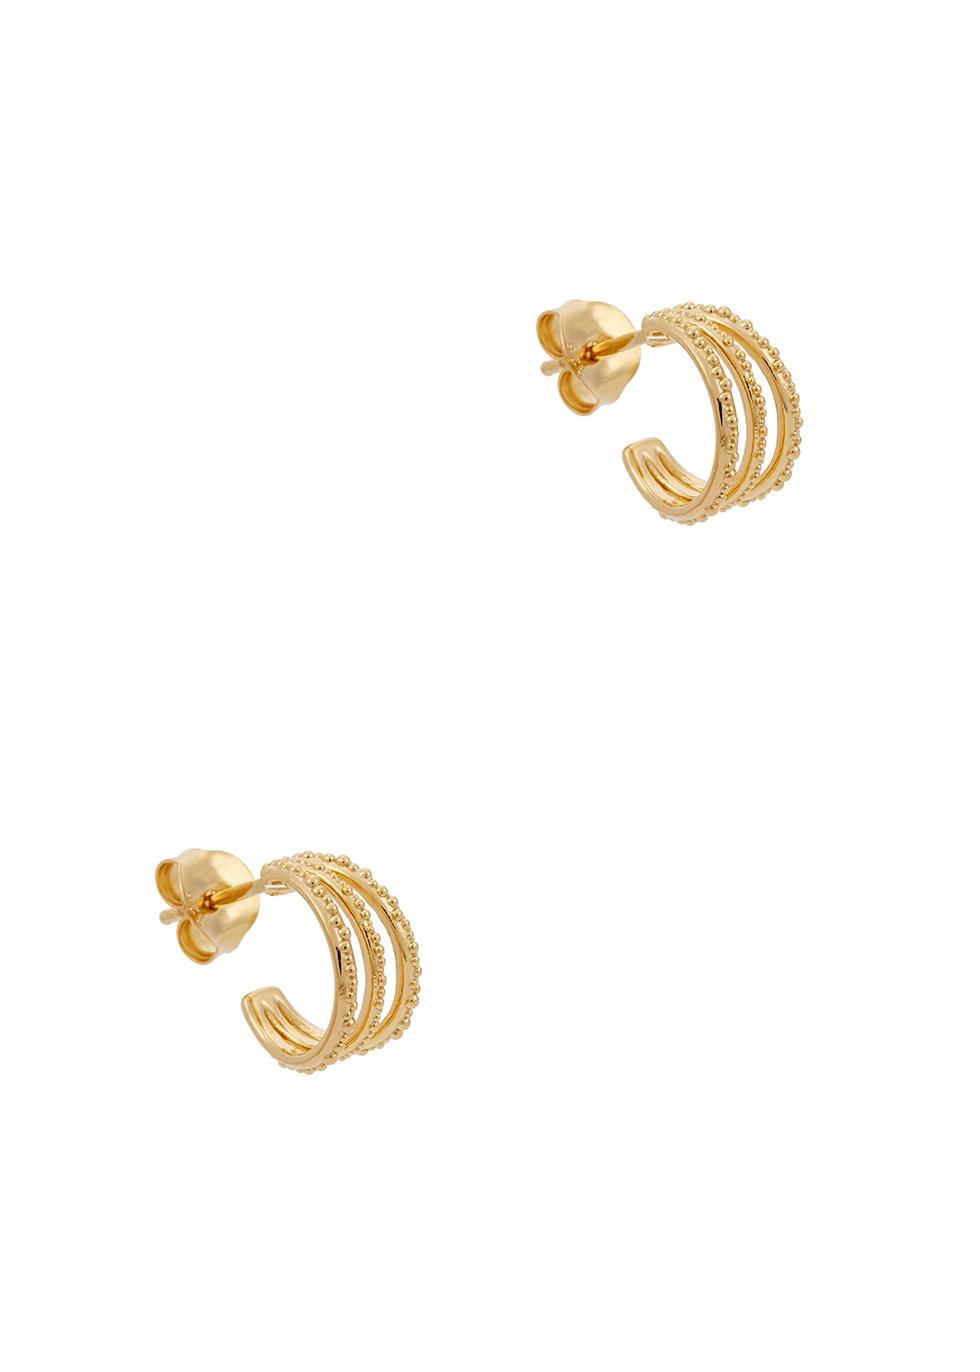 Amanda 18kt gold-plated hoop earrings